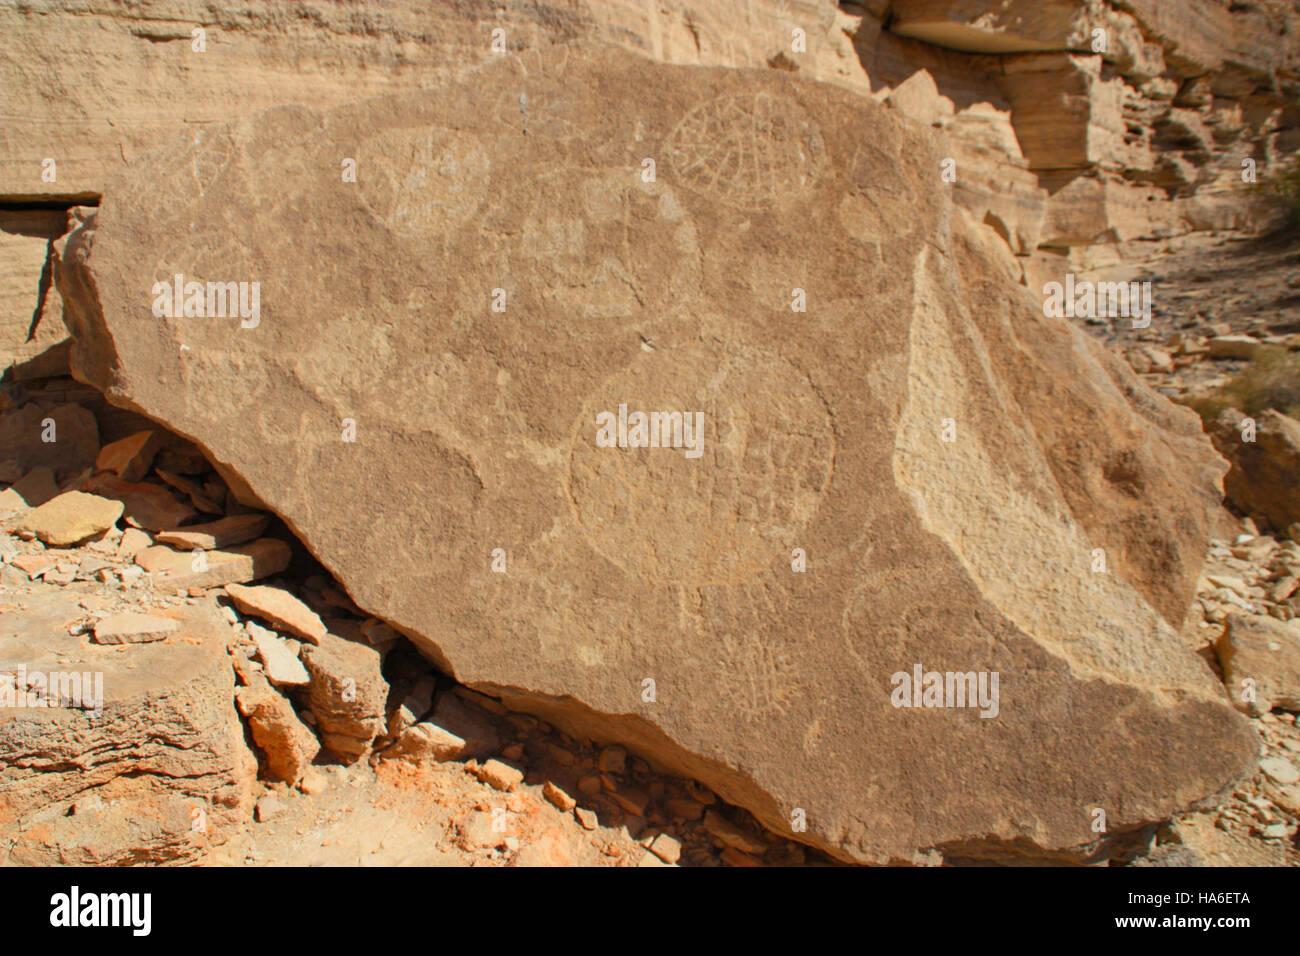 blmnevada 19791044950 Conservation area sheild man - Stock Image